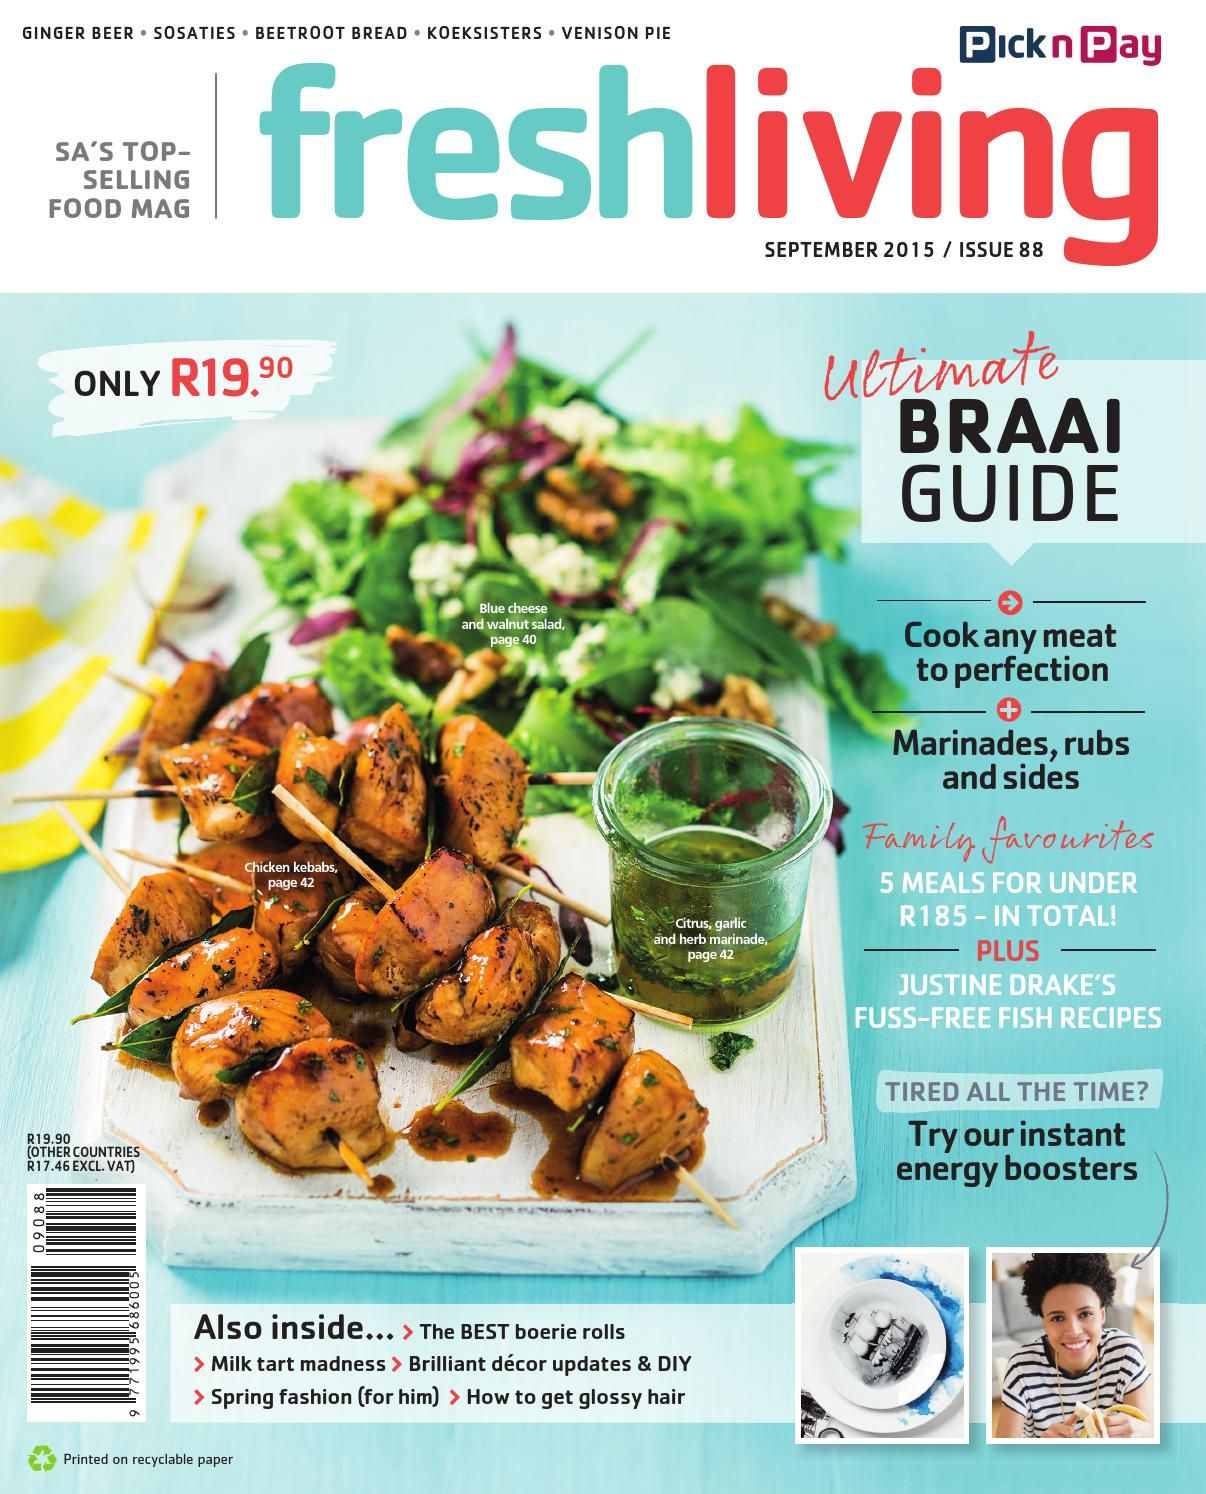 September 2015 Recipes >> Fresh Living September 2015 Recipes And Food